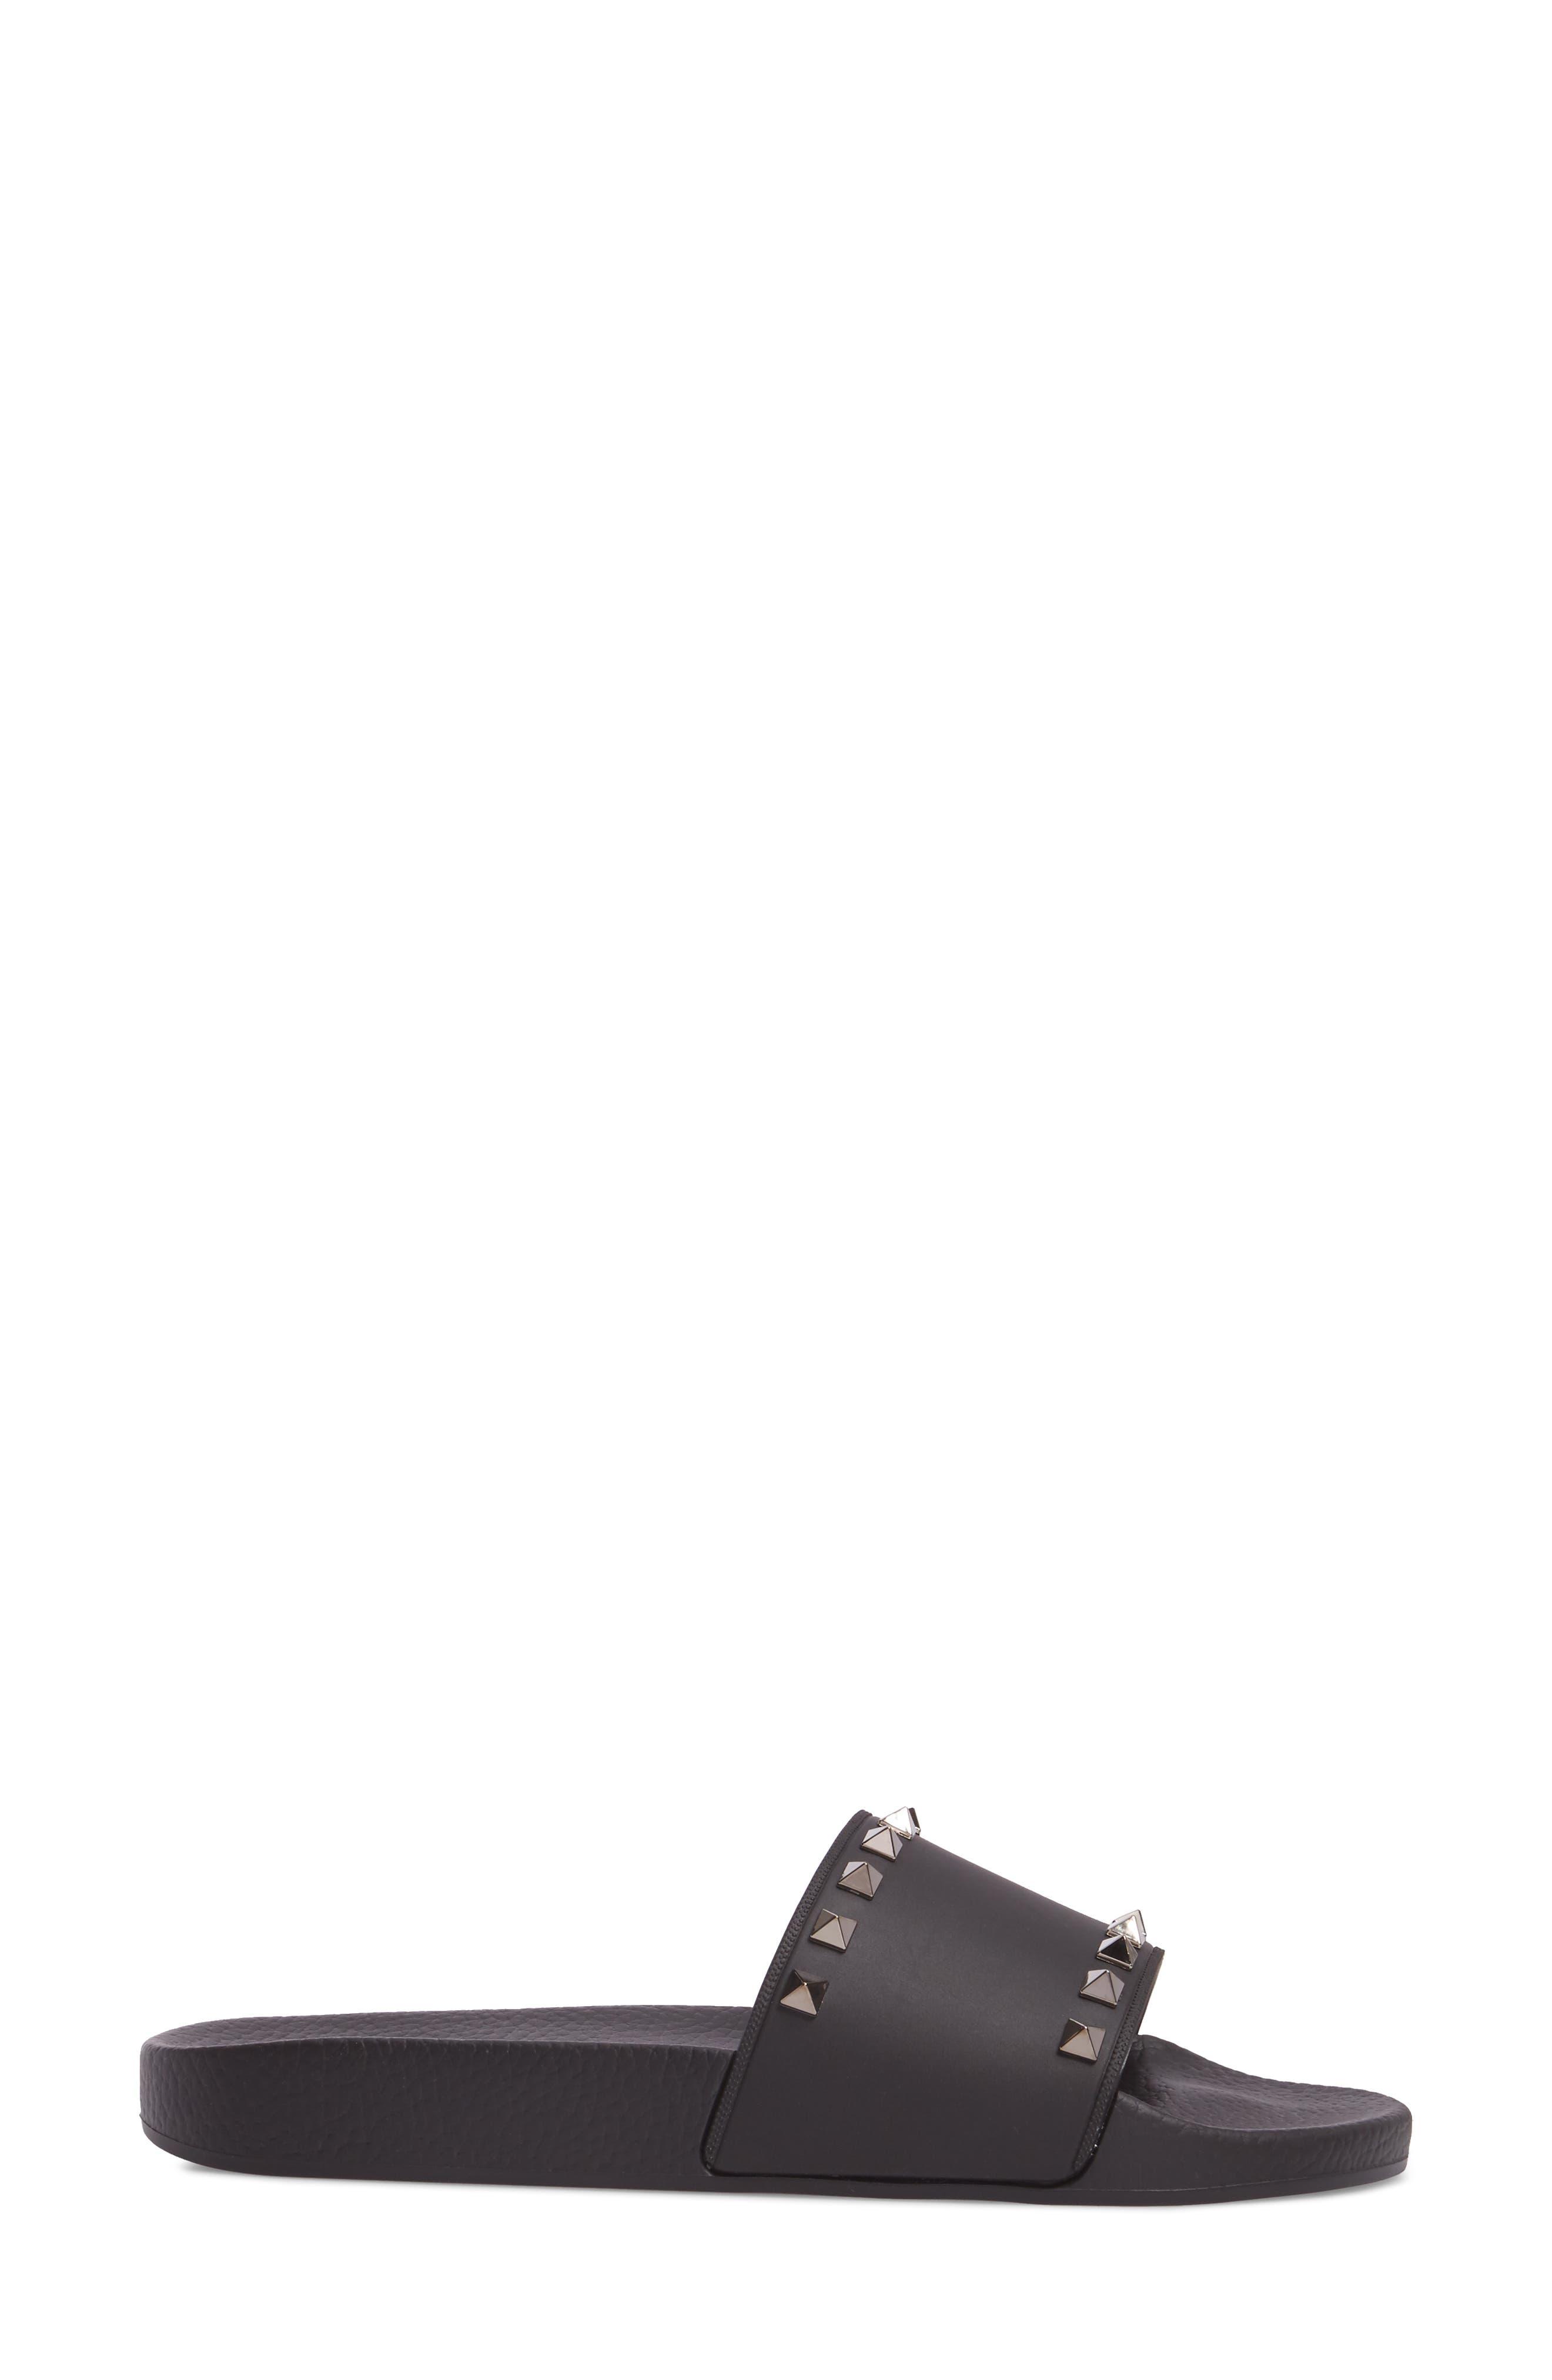 Rockstud Slide Sandal,                             Alternate thumbnail 3, color,                             NERO